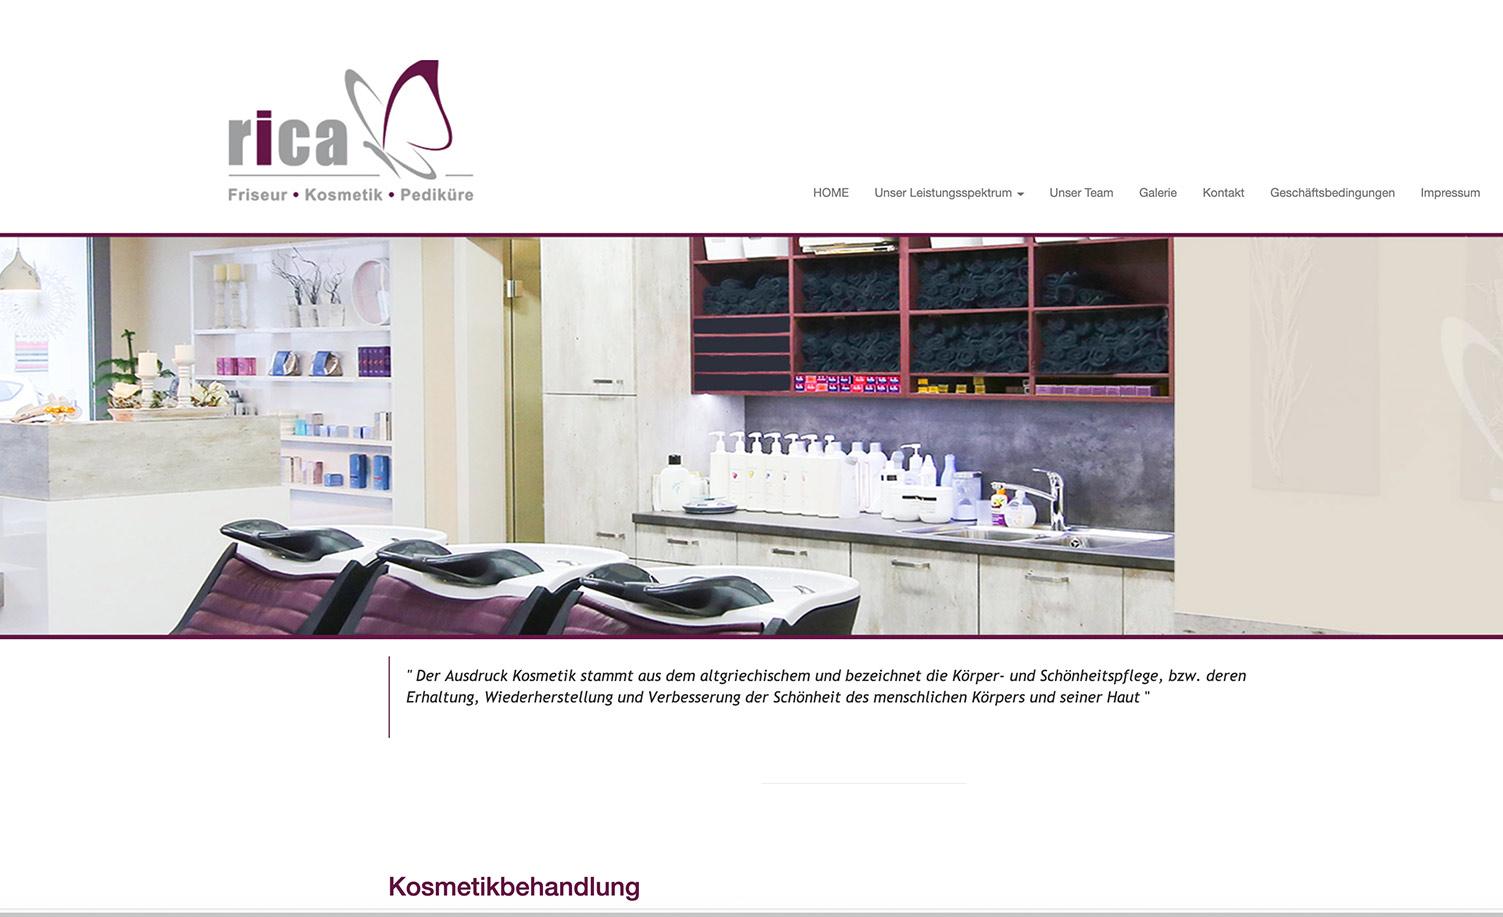 Webdesign, Grafikdesign, Falkensee, Berlin-Spandau